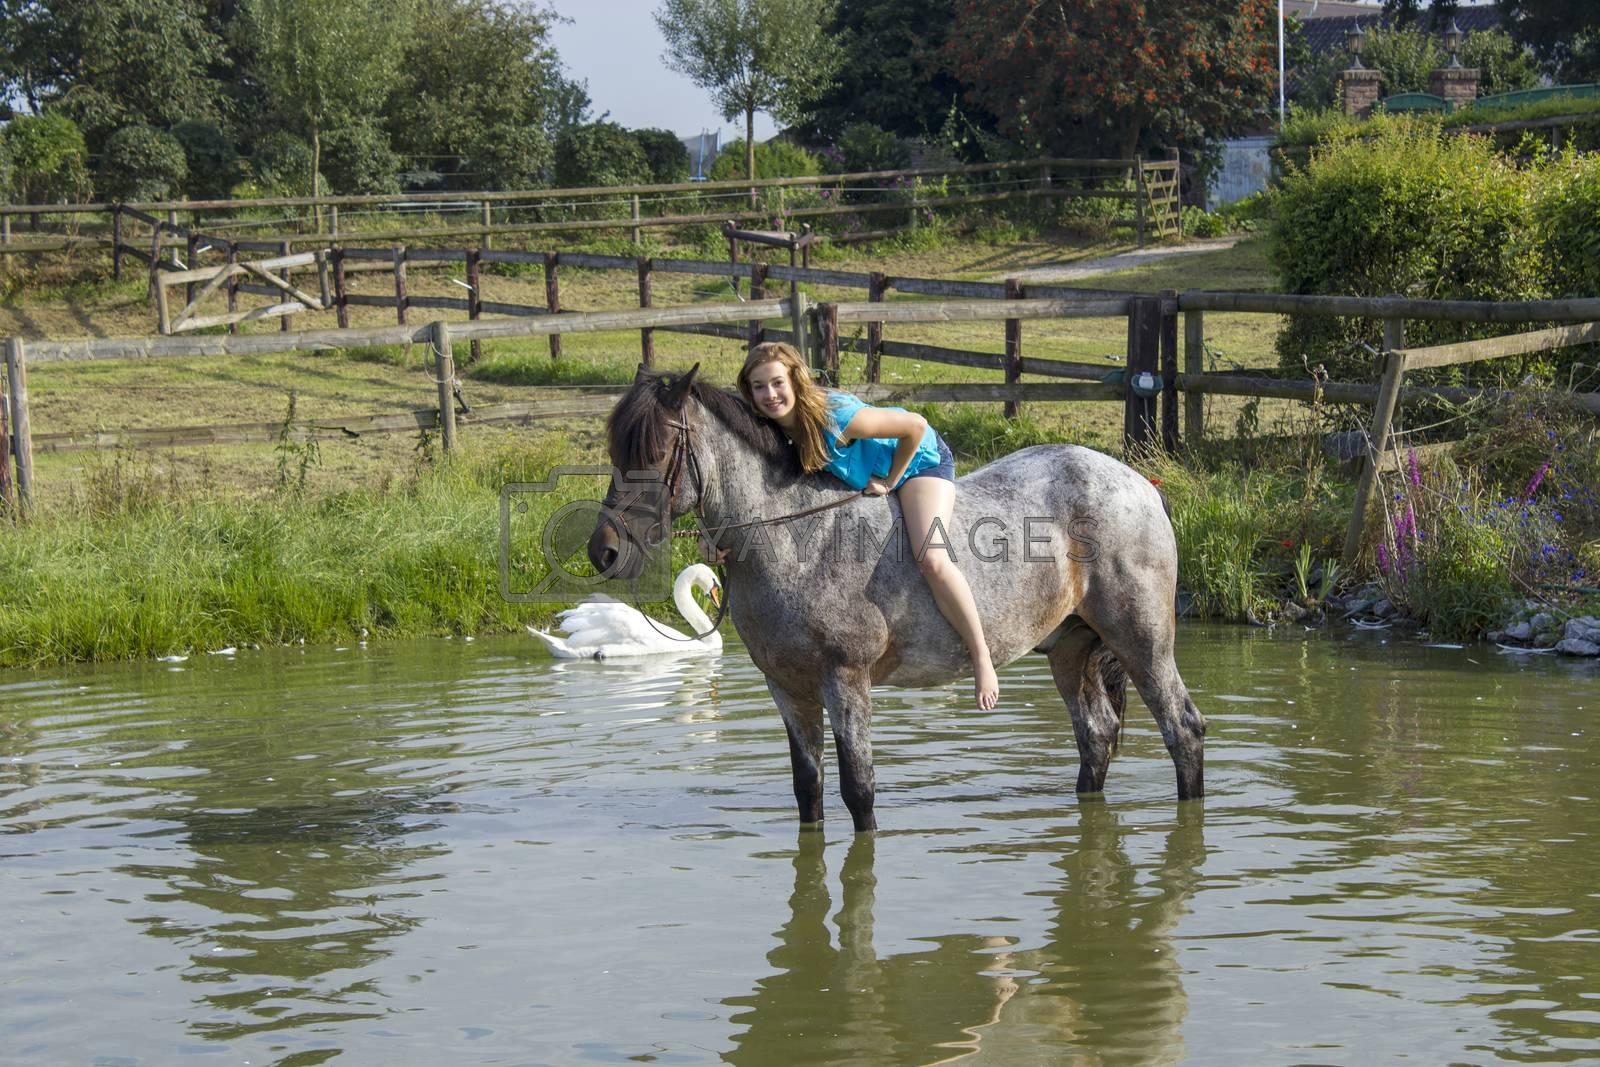 young girl riding a horse outdoors